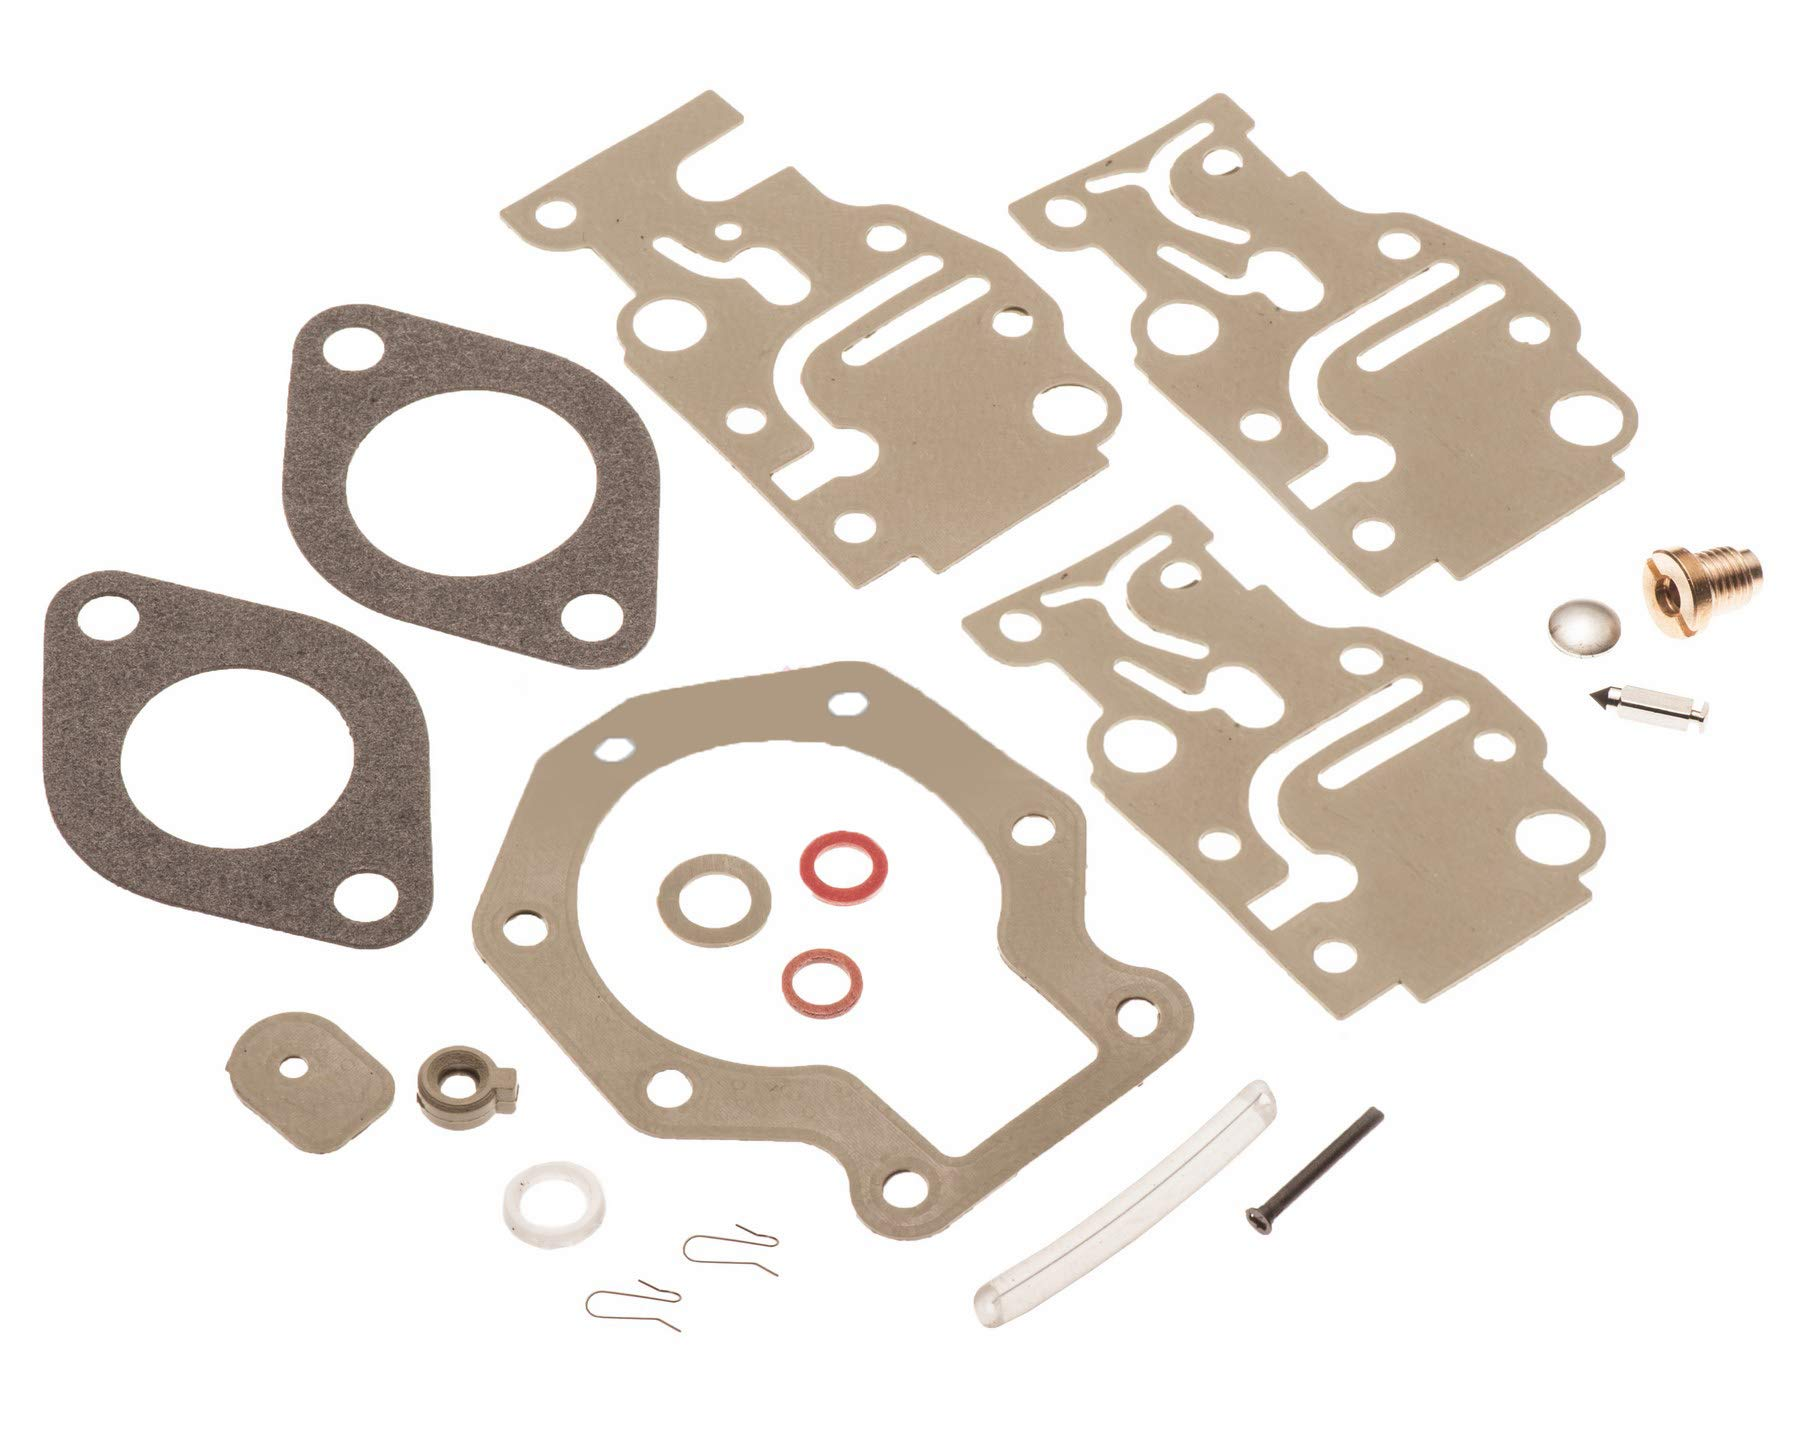 Johnson Evinrude Carb Carburetor Rebuild Kit 439073 431897 6 8 9.9 15 20 HP